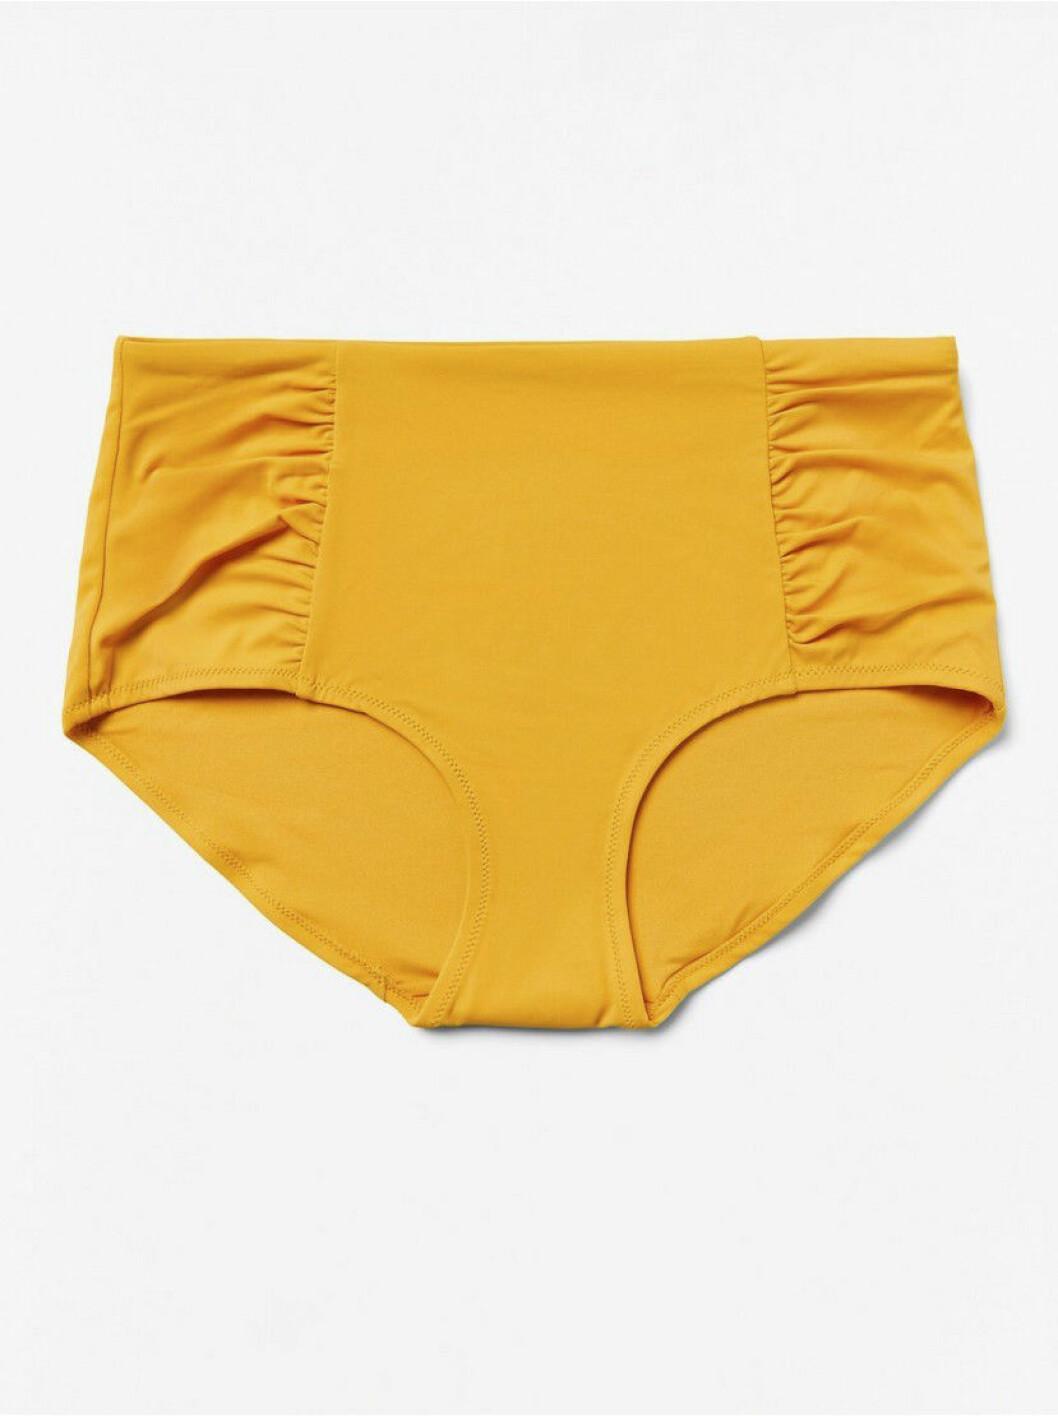 Gul bikiniunderdel från Lindex.